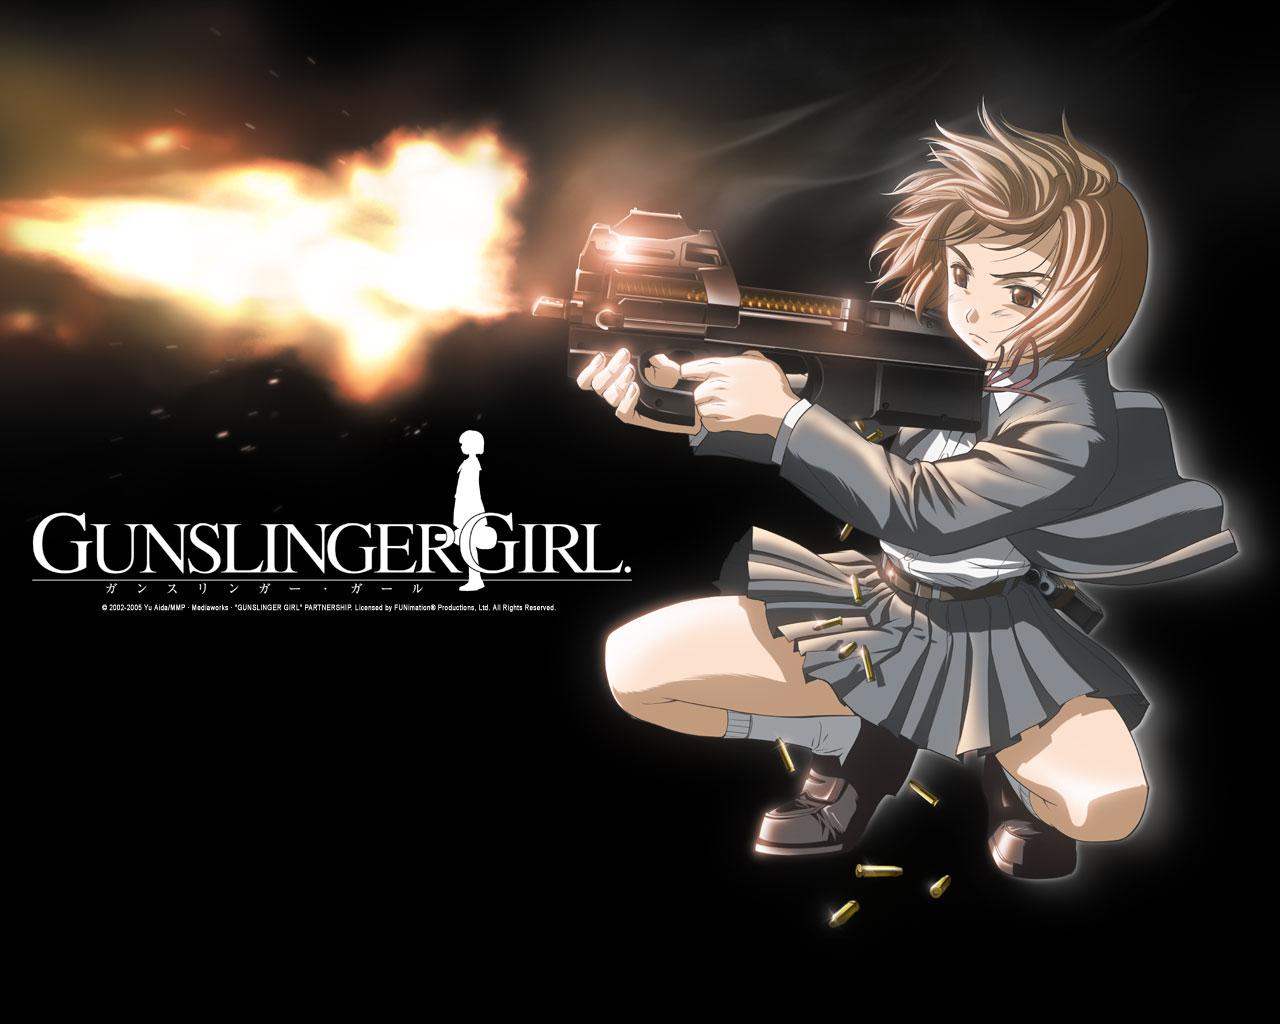 Gunslinger Girl Backgrounds on Wallpapers Vista